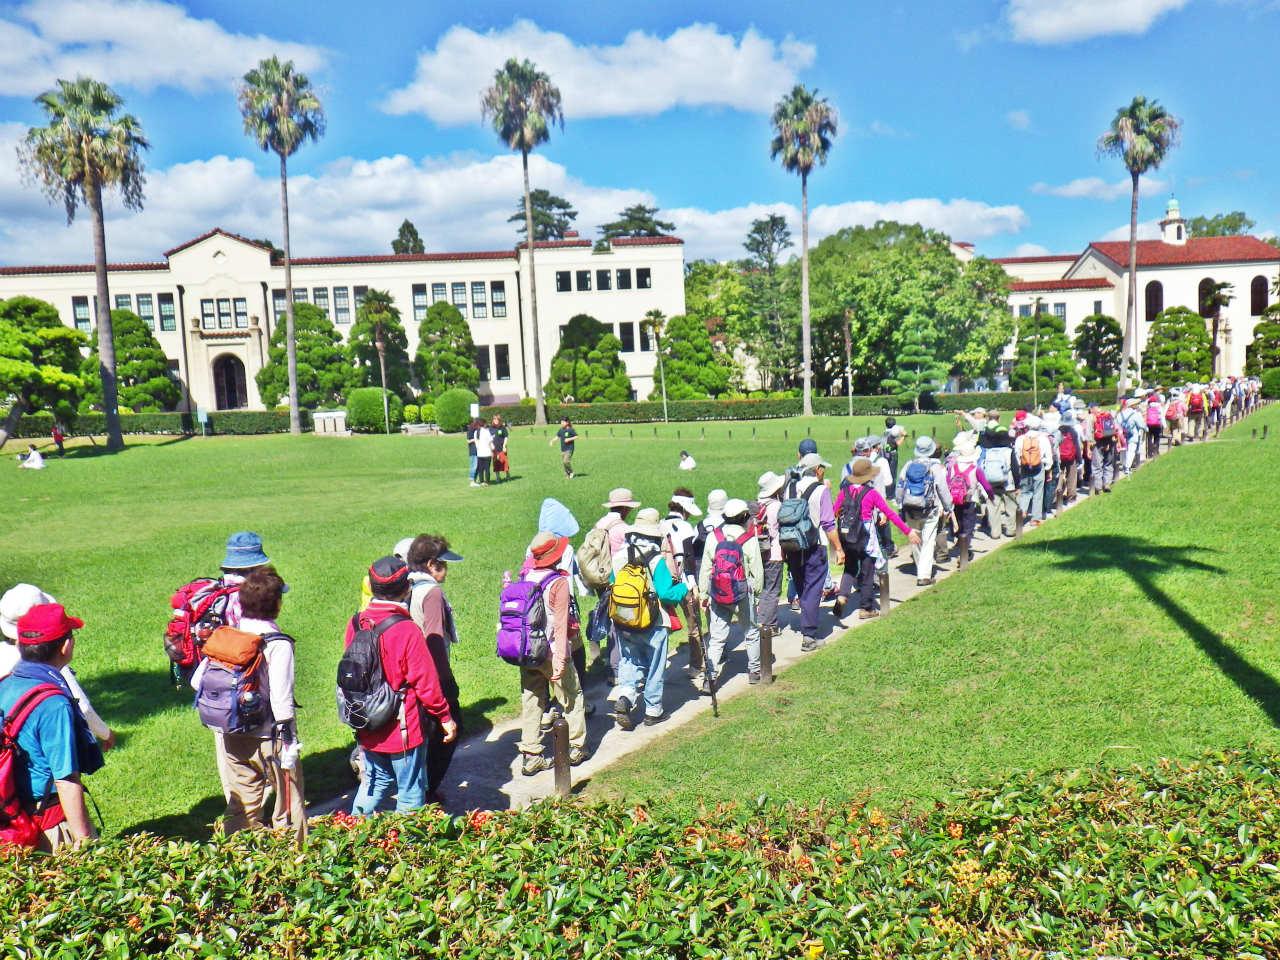 23b 大学キャンパスを横断